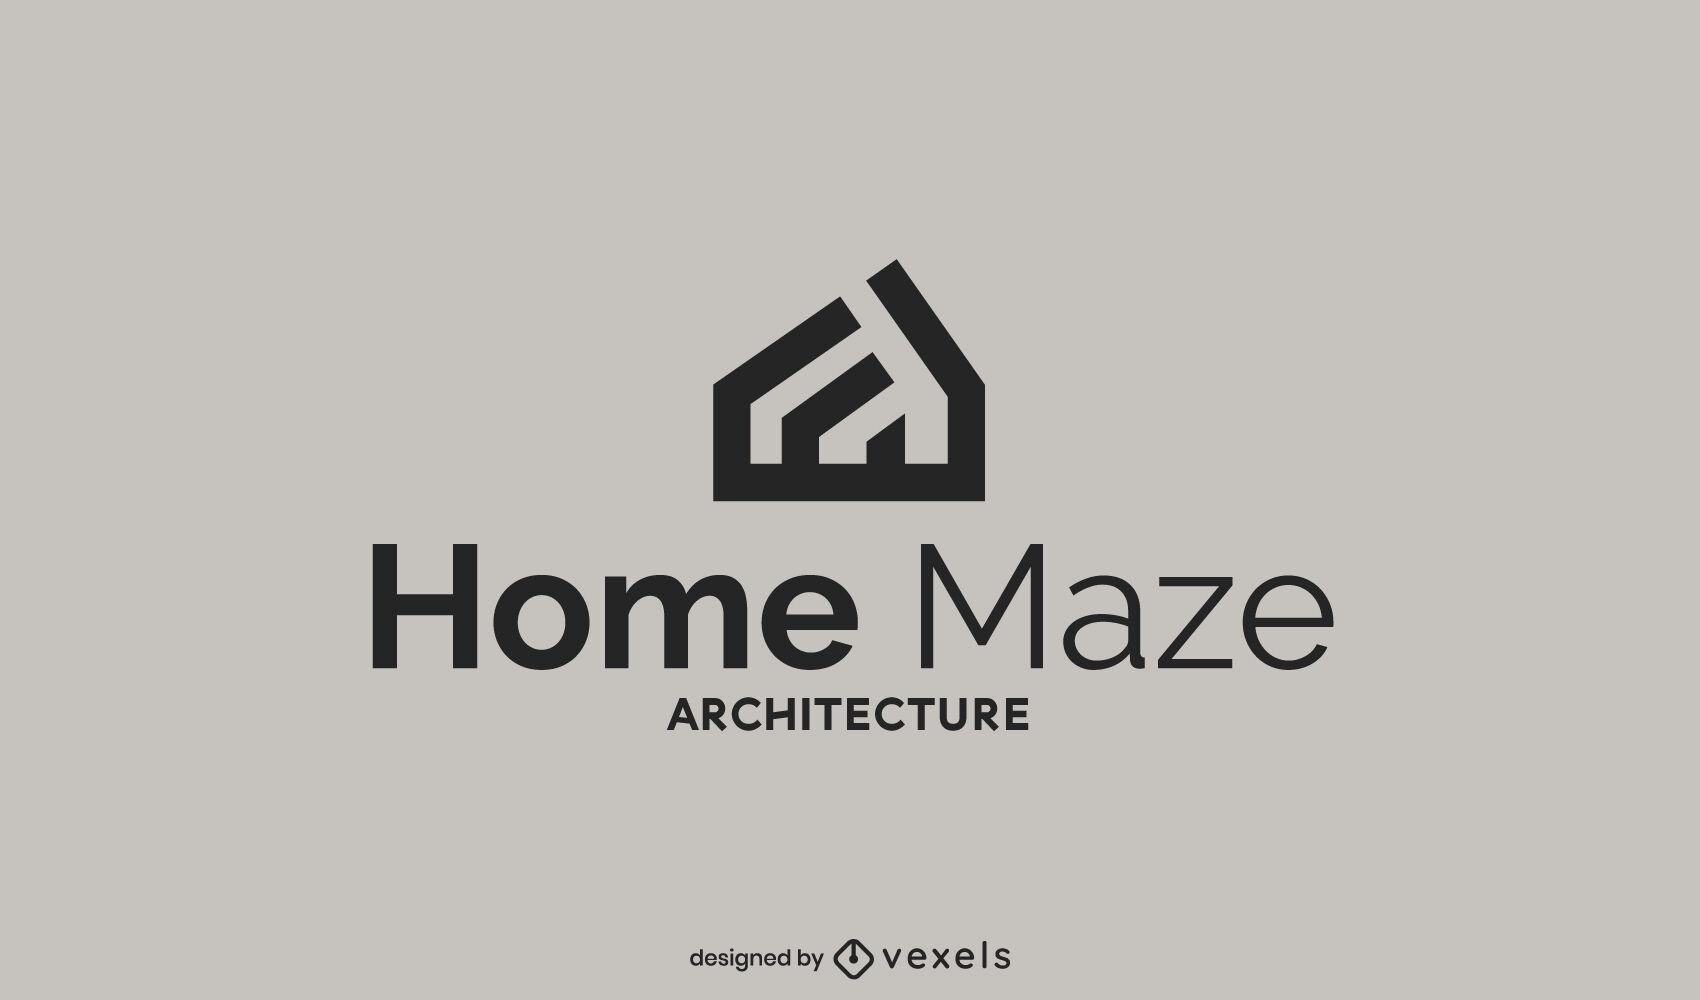 Abstract house shape logo template